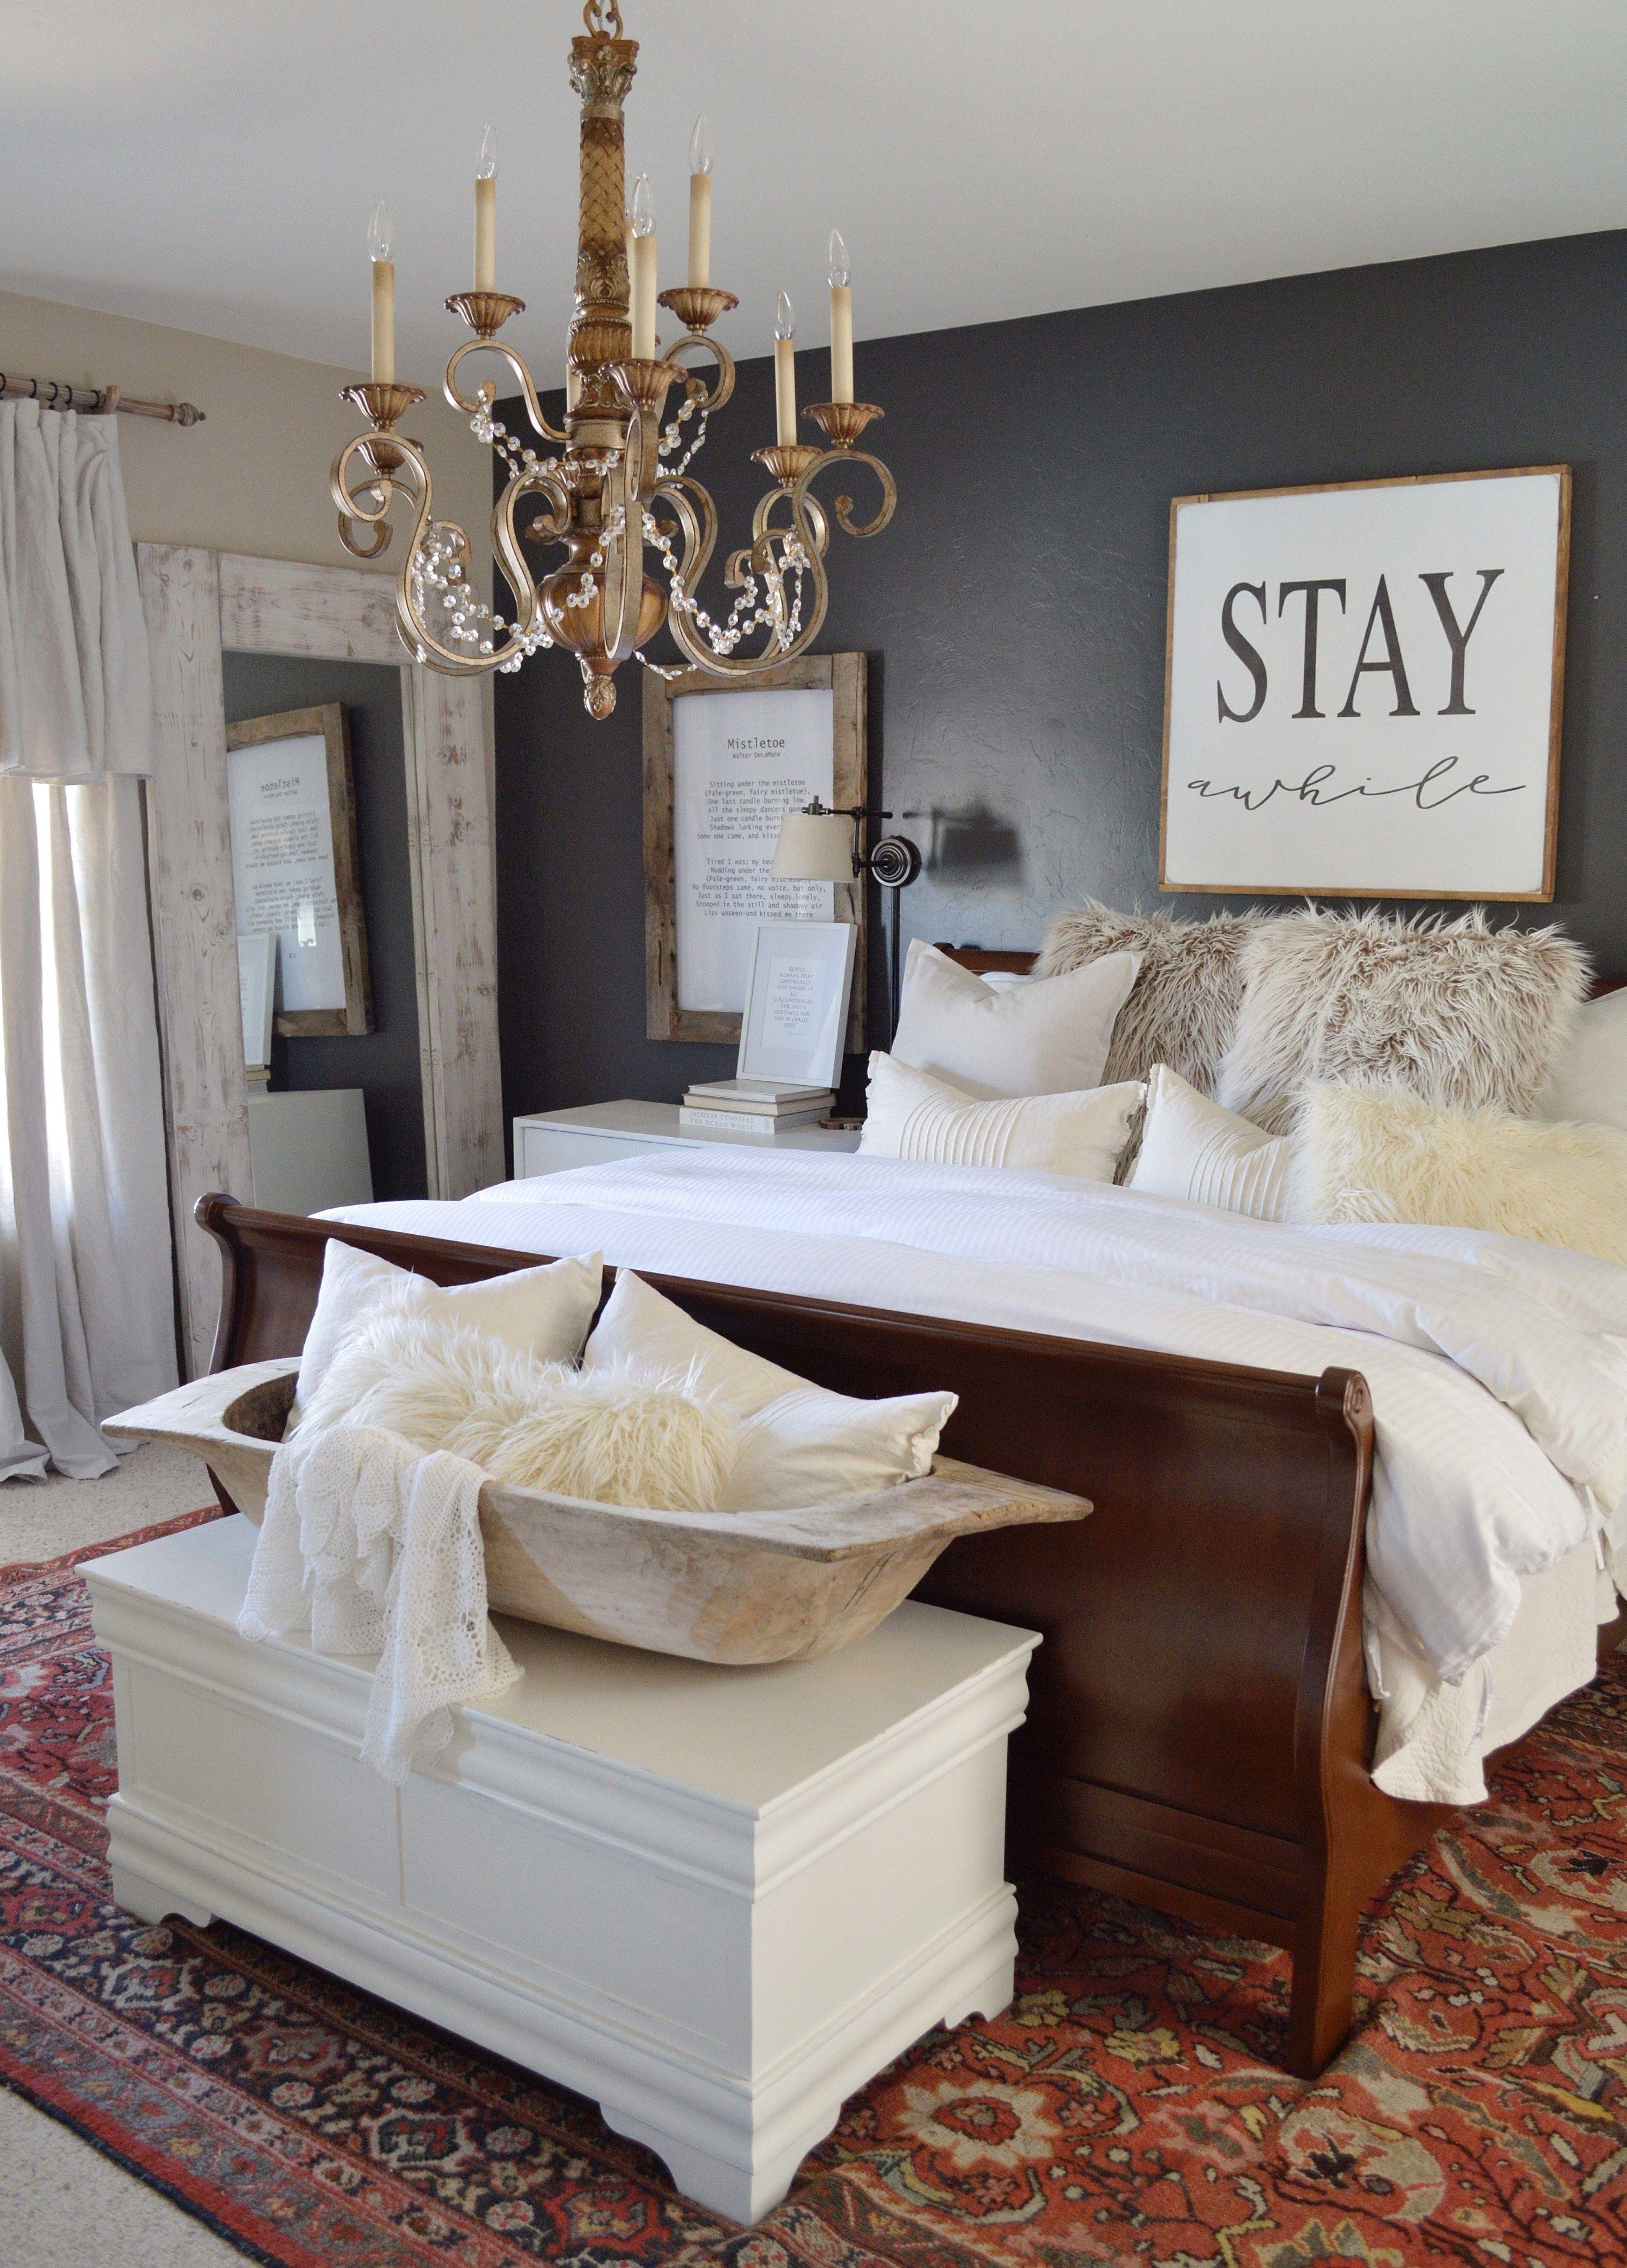 Diy drop cloth curtains home decor bedroom modern